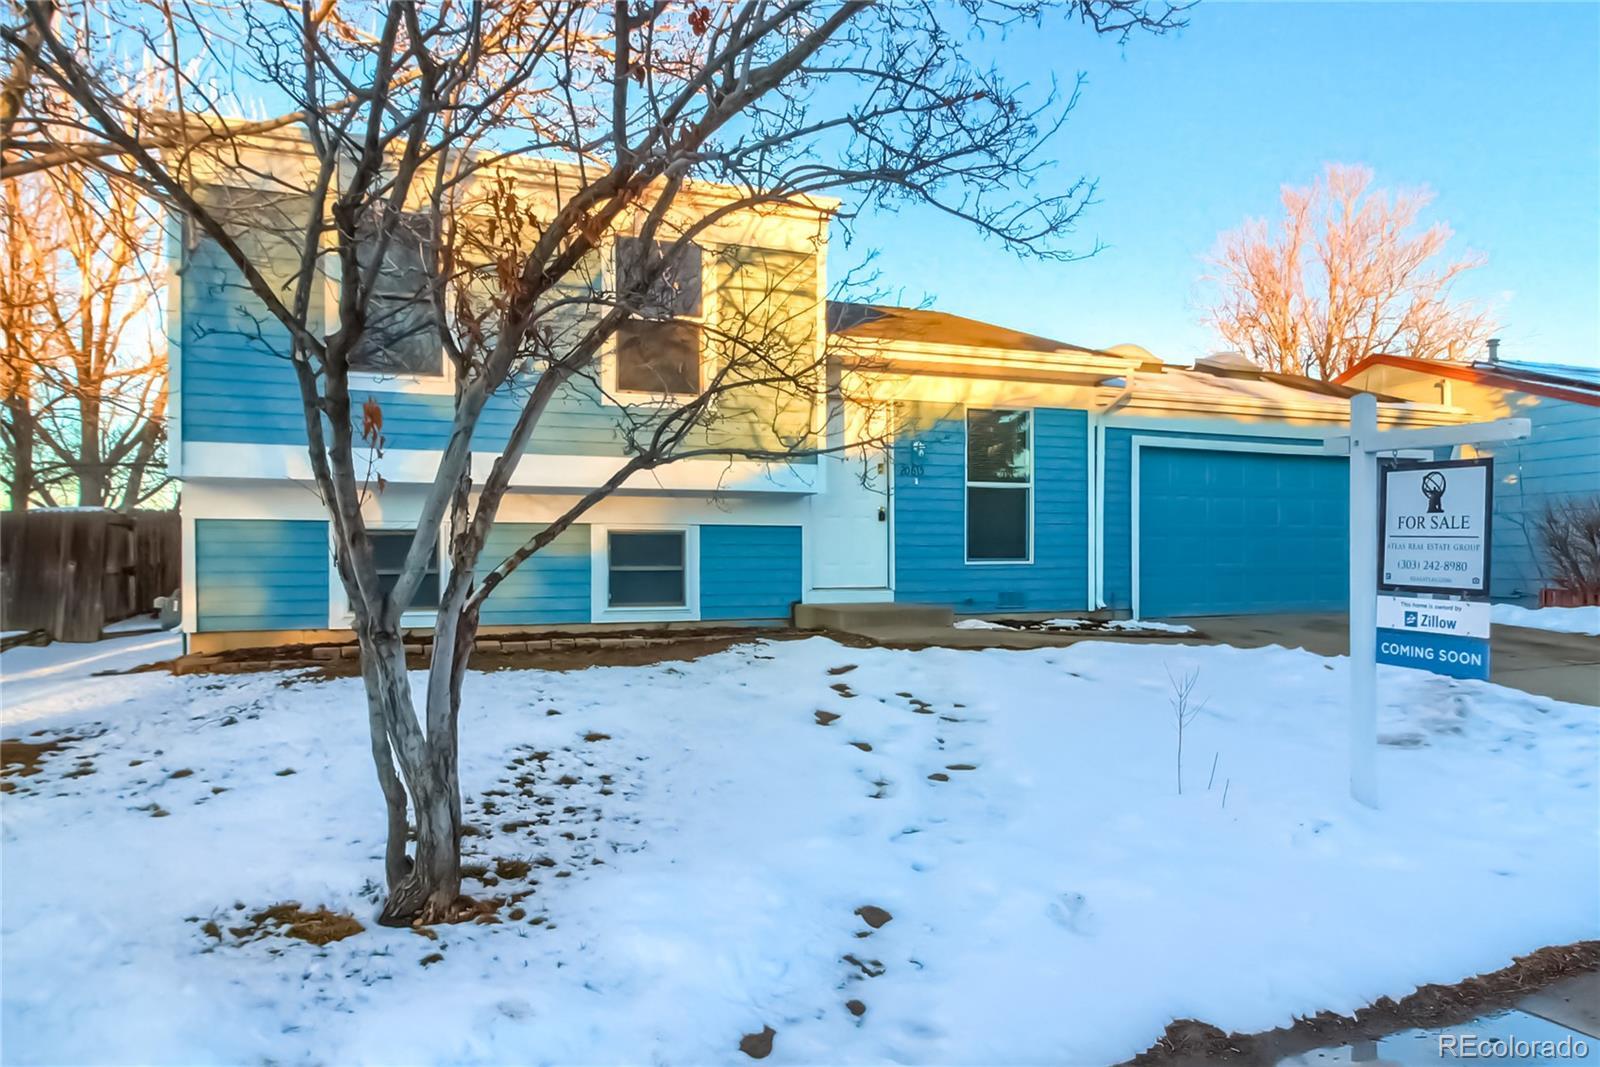 MLS# 8804701 - 3 - 20615 E Coolidge Place, Aurora, CO 80011